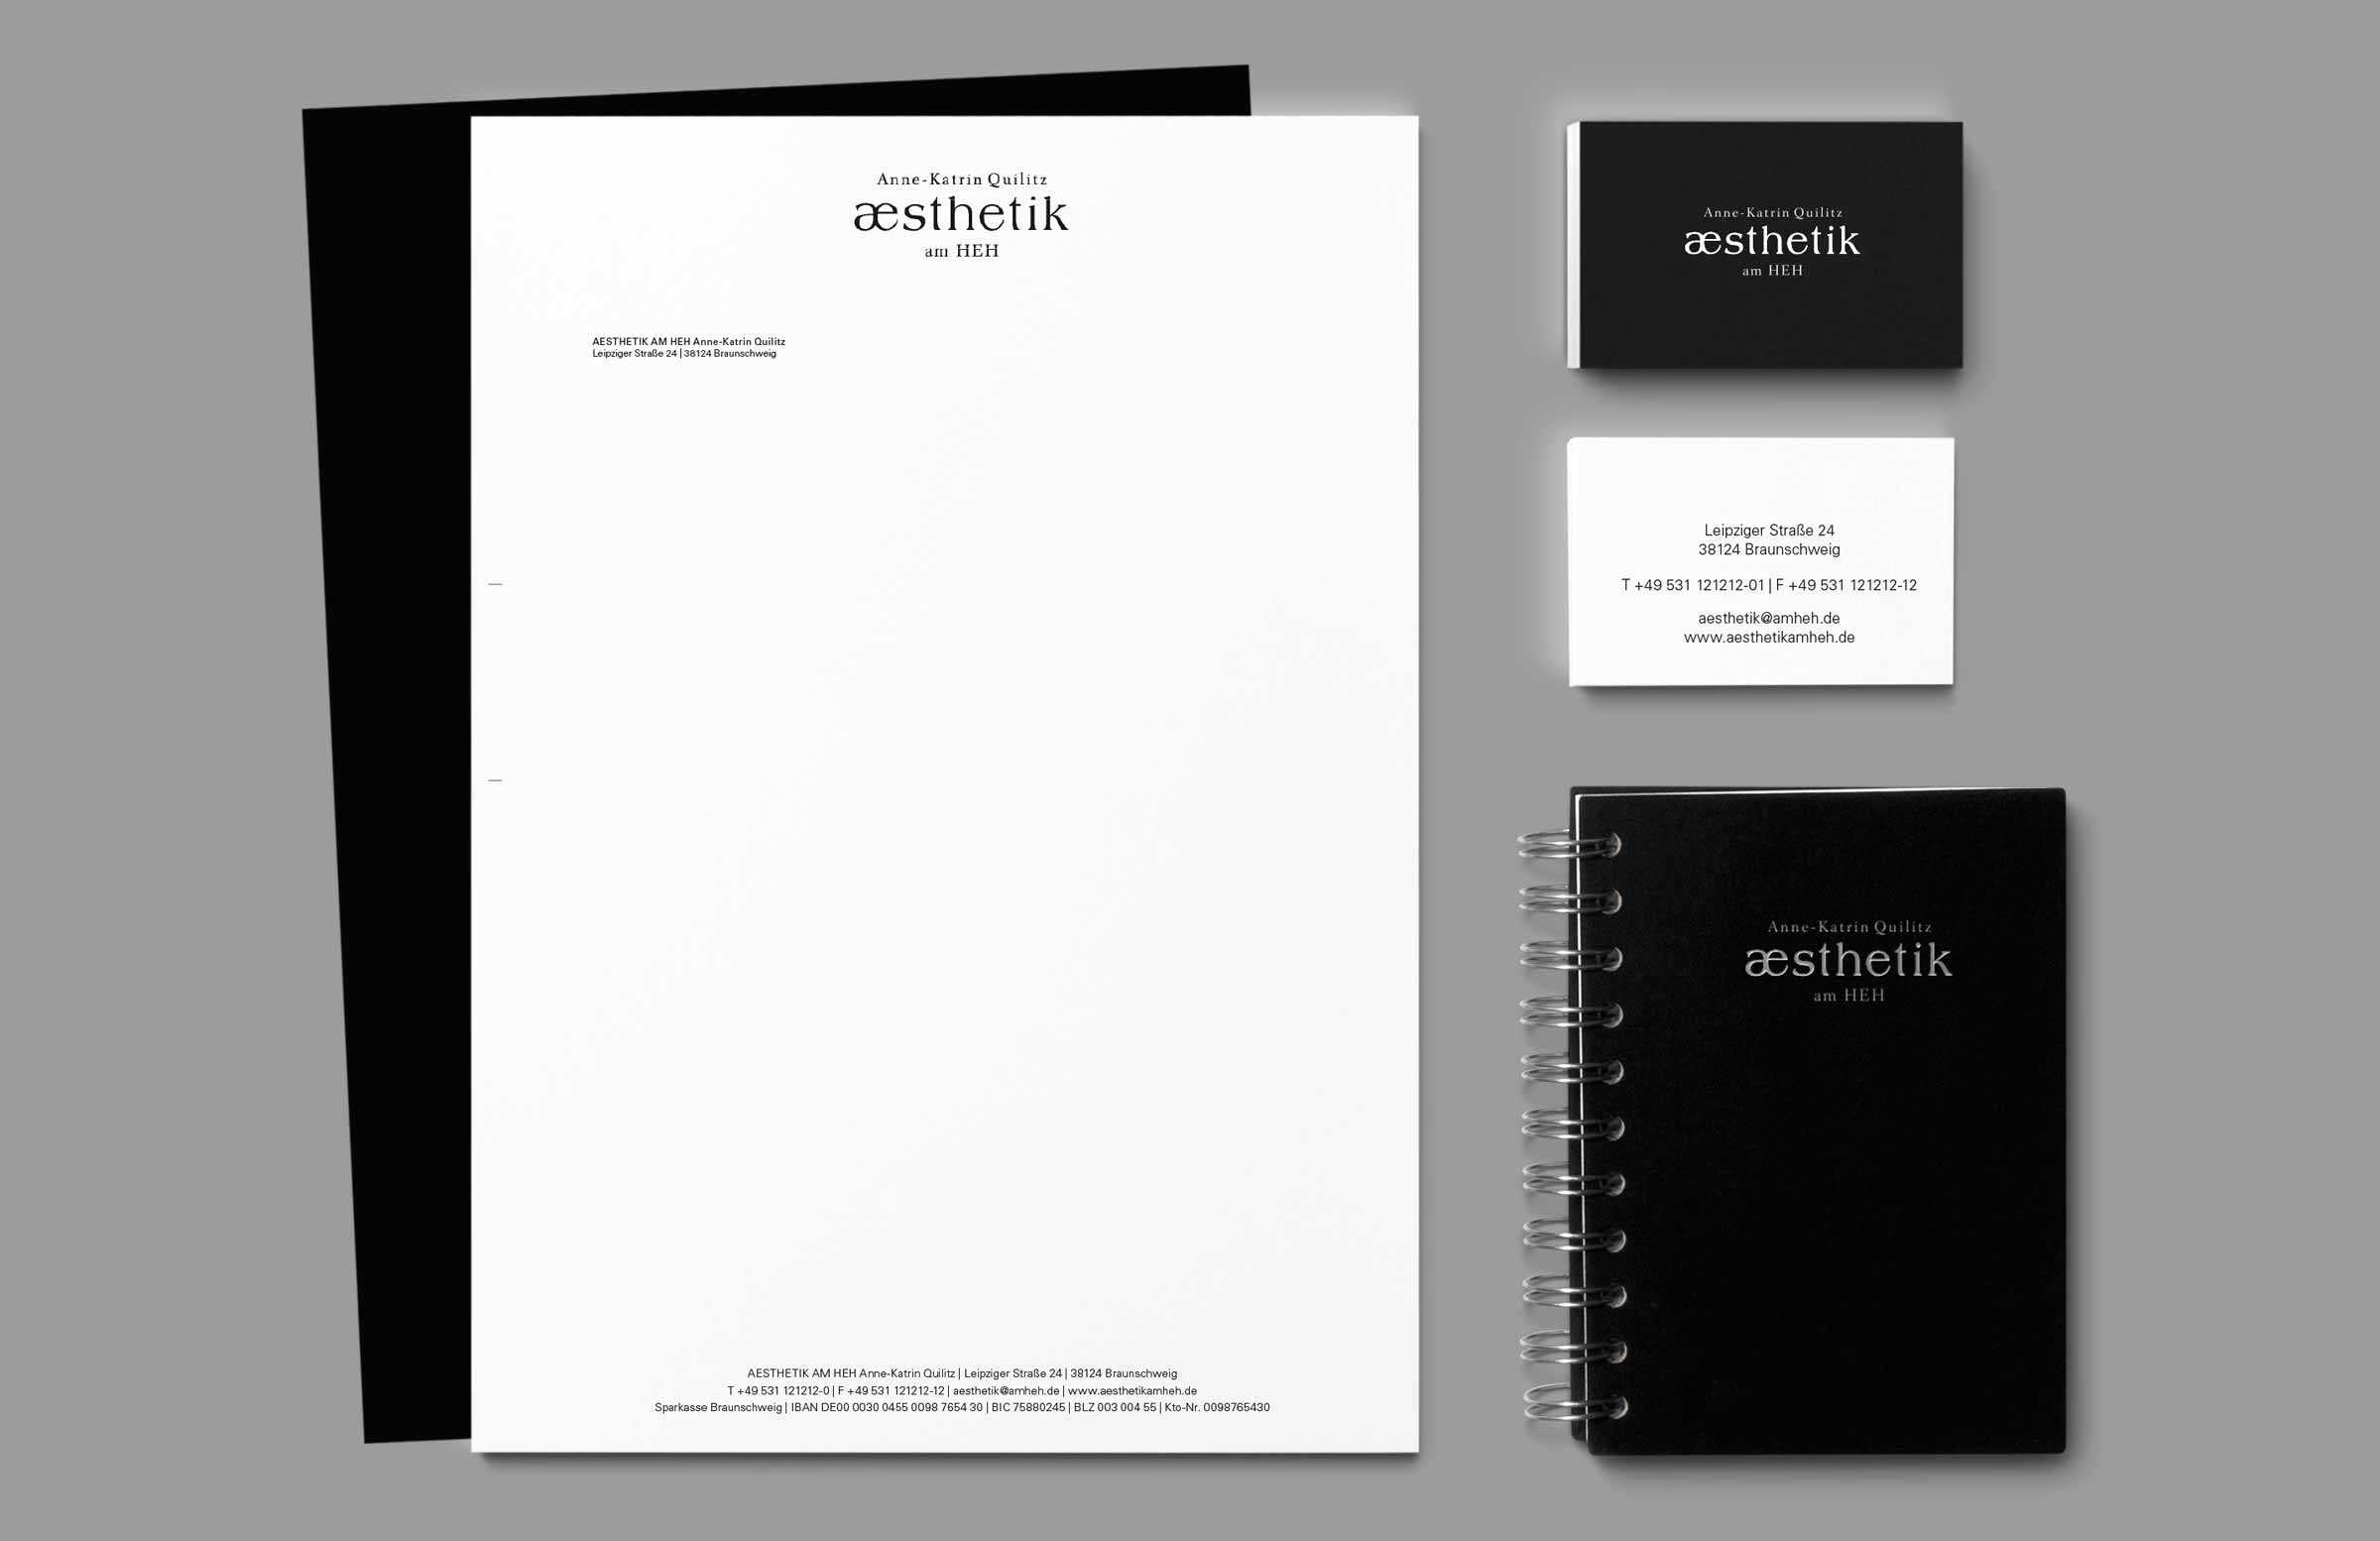 Neue Geschäftsausstattung im neuen Praxis Corporate Design